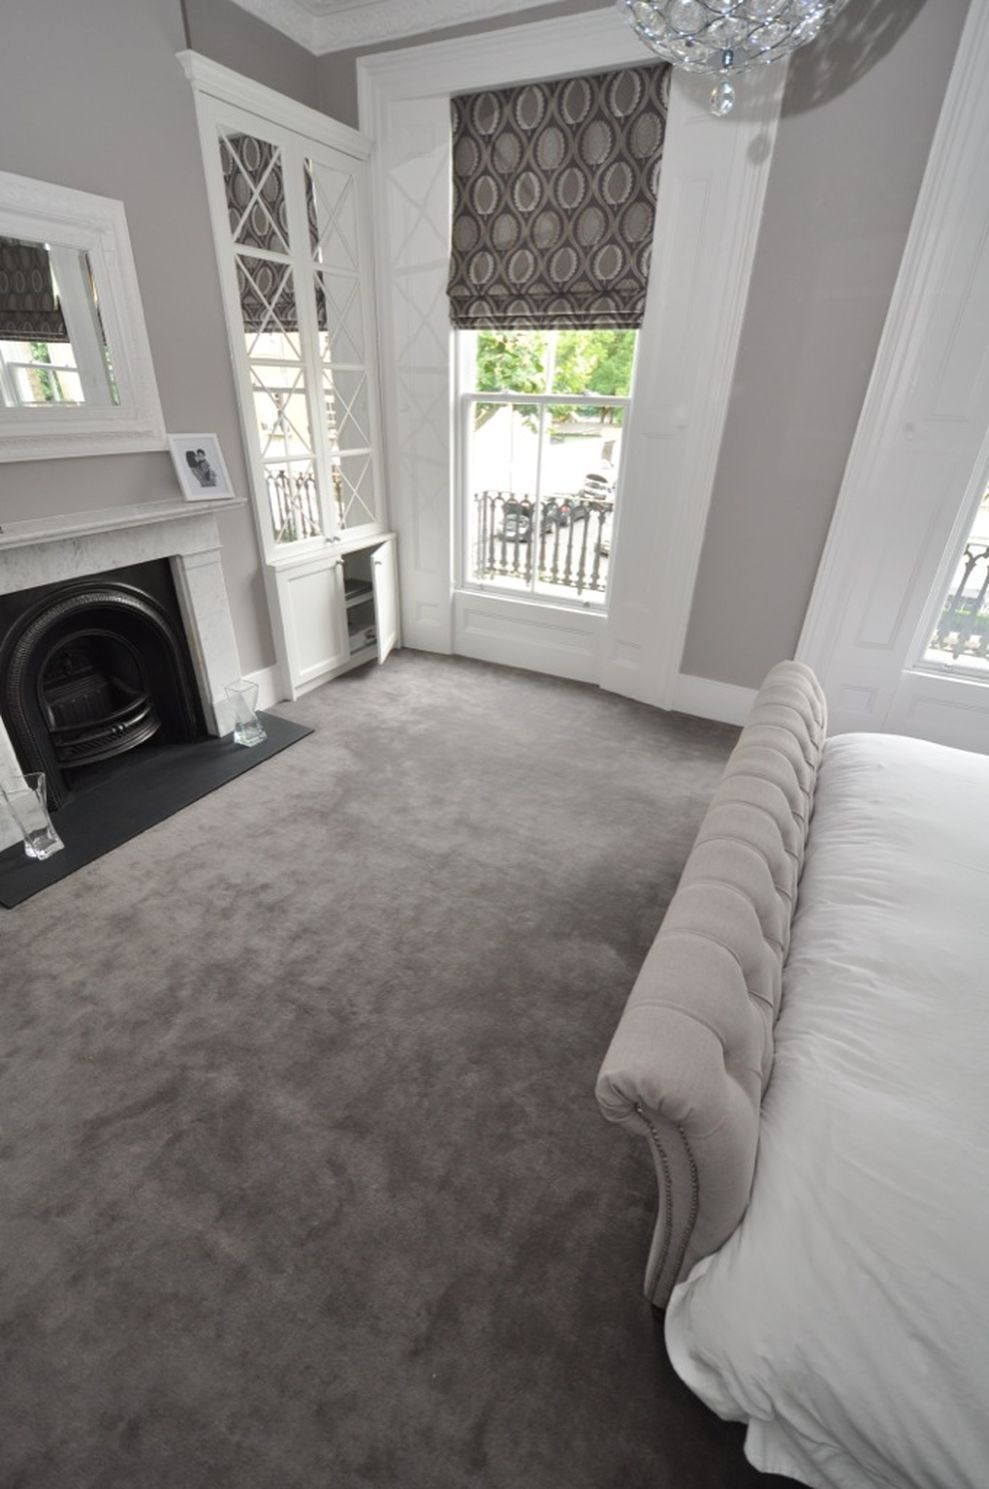 100 Beautiful Bedroom Design Ideas Using Grey Carpet Roundecor Bedroom Carpet Colors Grey Carpet Living Room Grey Carpet Bedroom